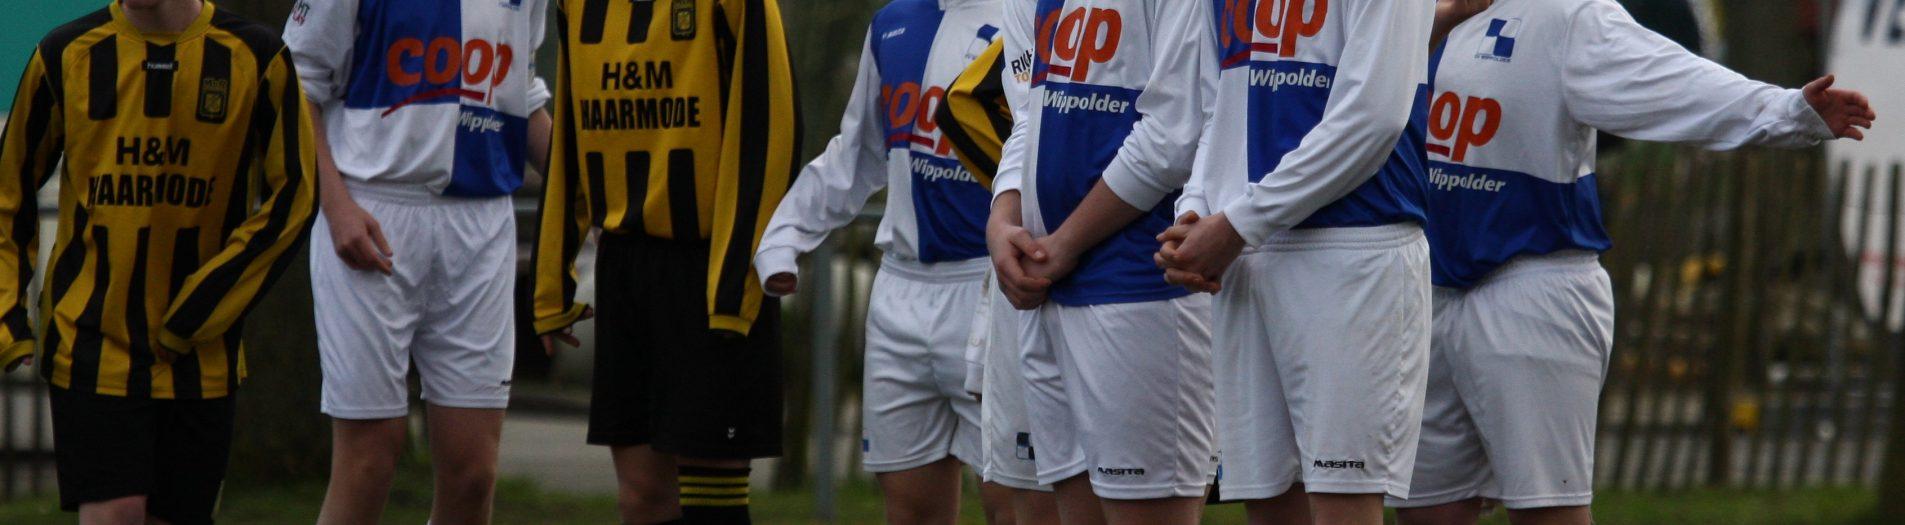 Oostende 1 (poulewedstrijden)